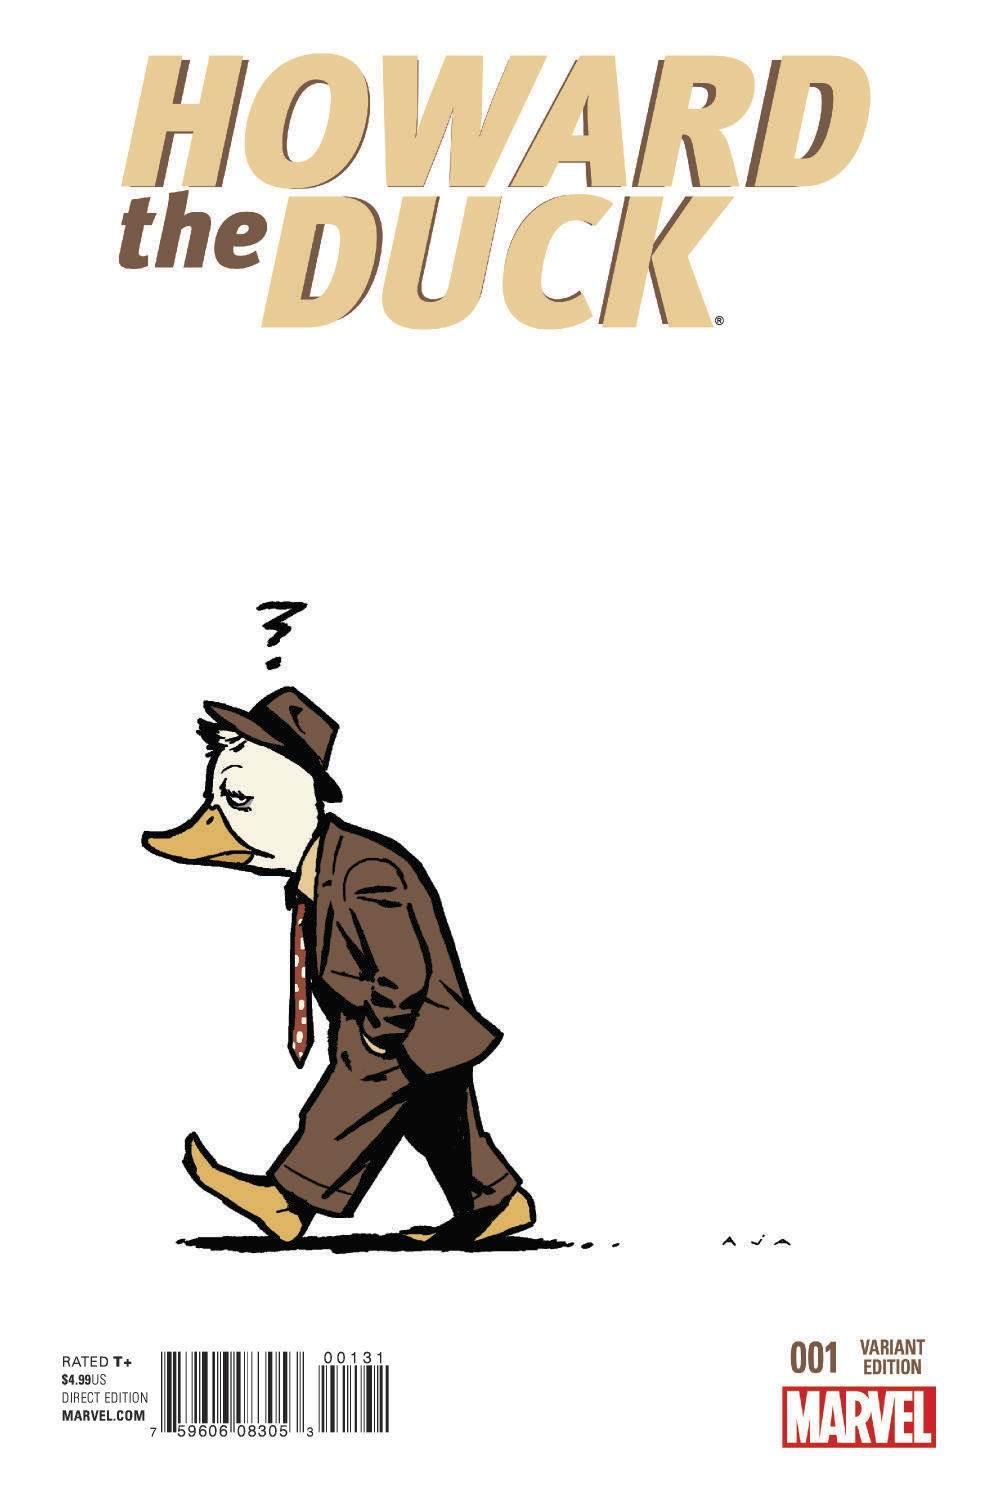 Howard_the_Duck_1_Aja_Variant